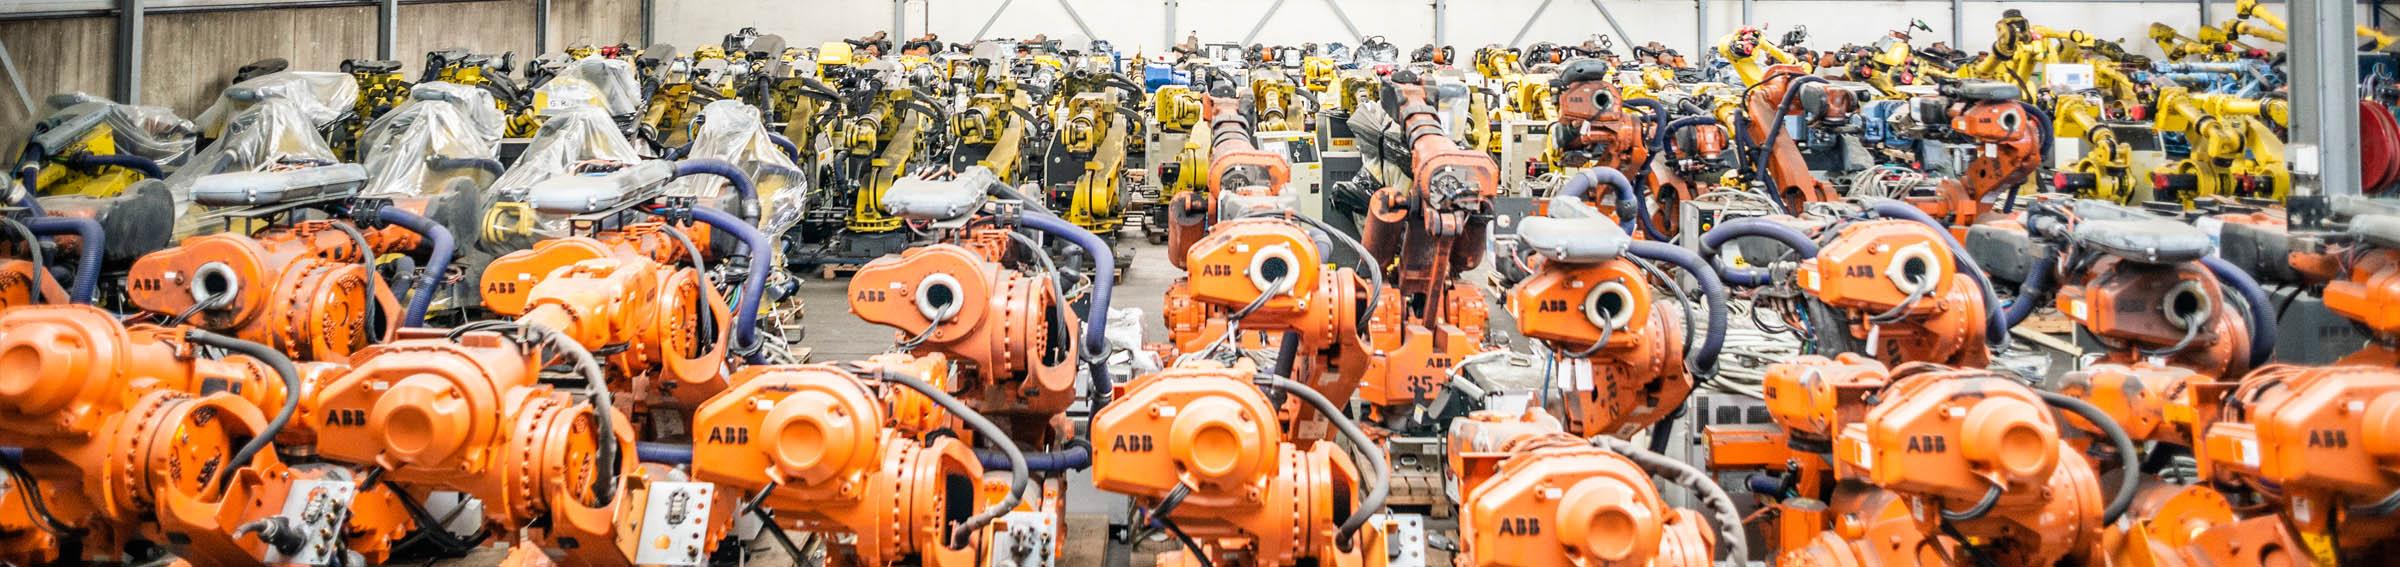 IRS Robotics refurbished robot stock